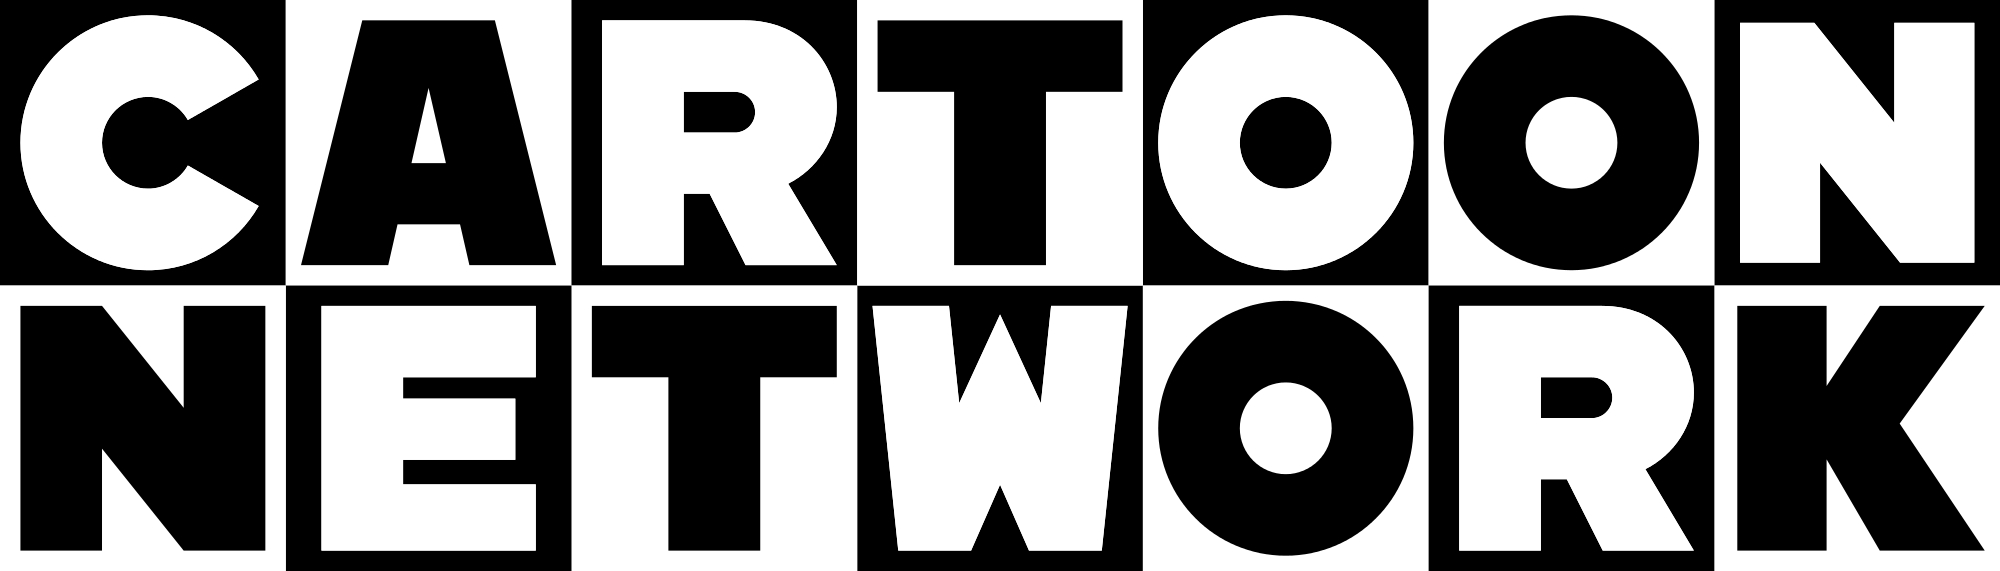 Cartoon Network Original Logo Top Ten Tv